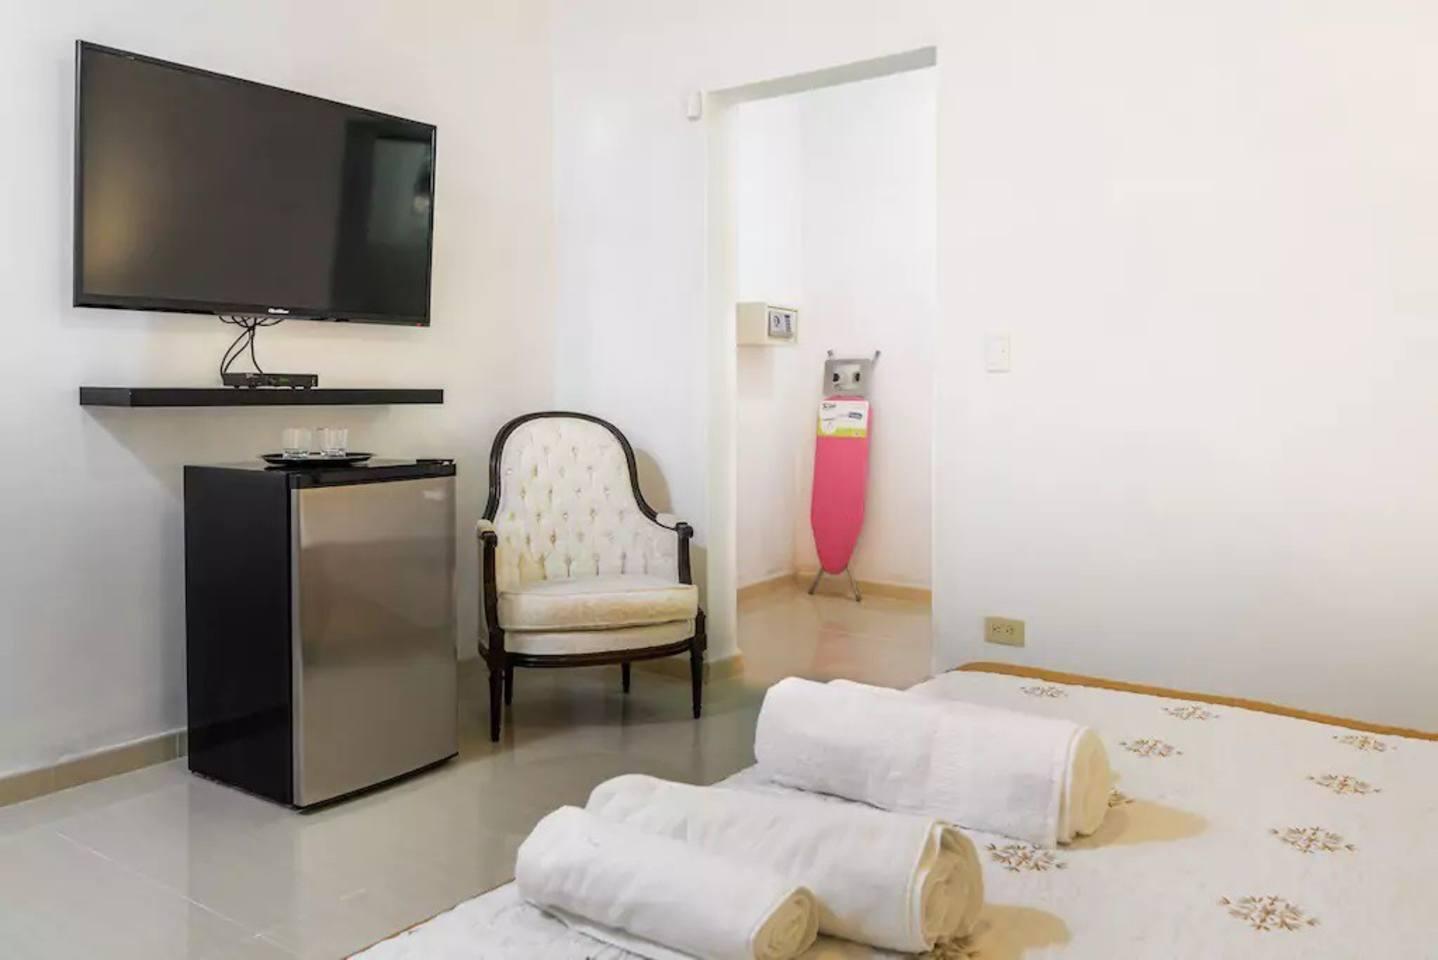 Apartment Villa Don Teto Suite   8 Rooms  Great Havana View photo 16924672